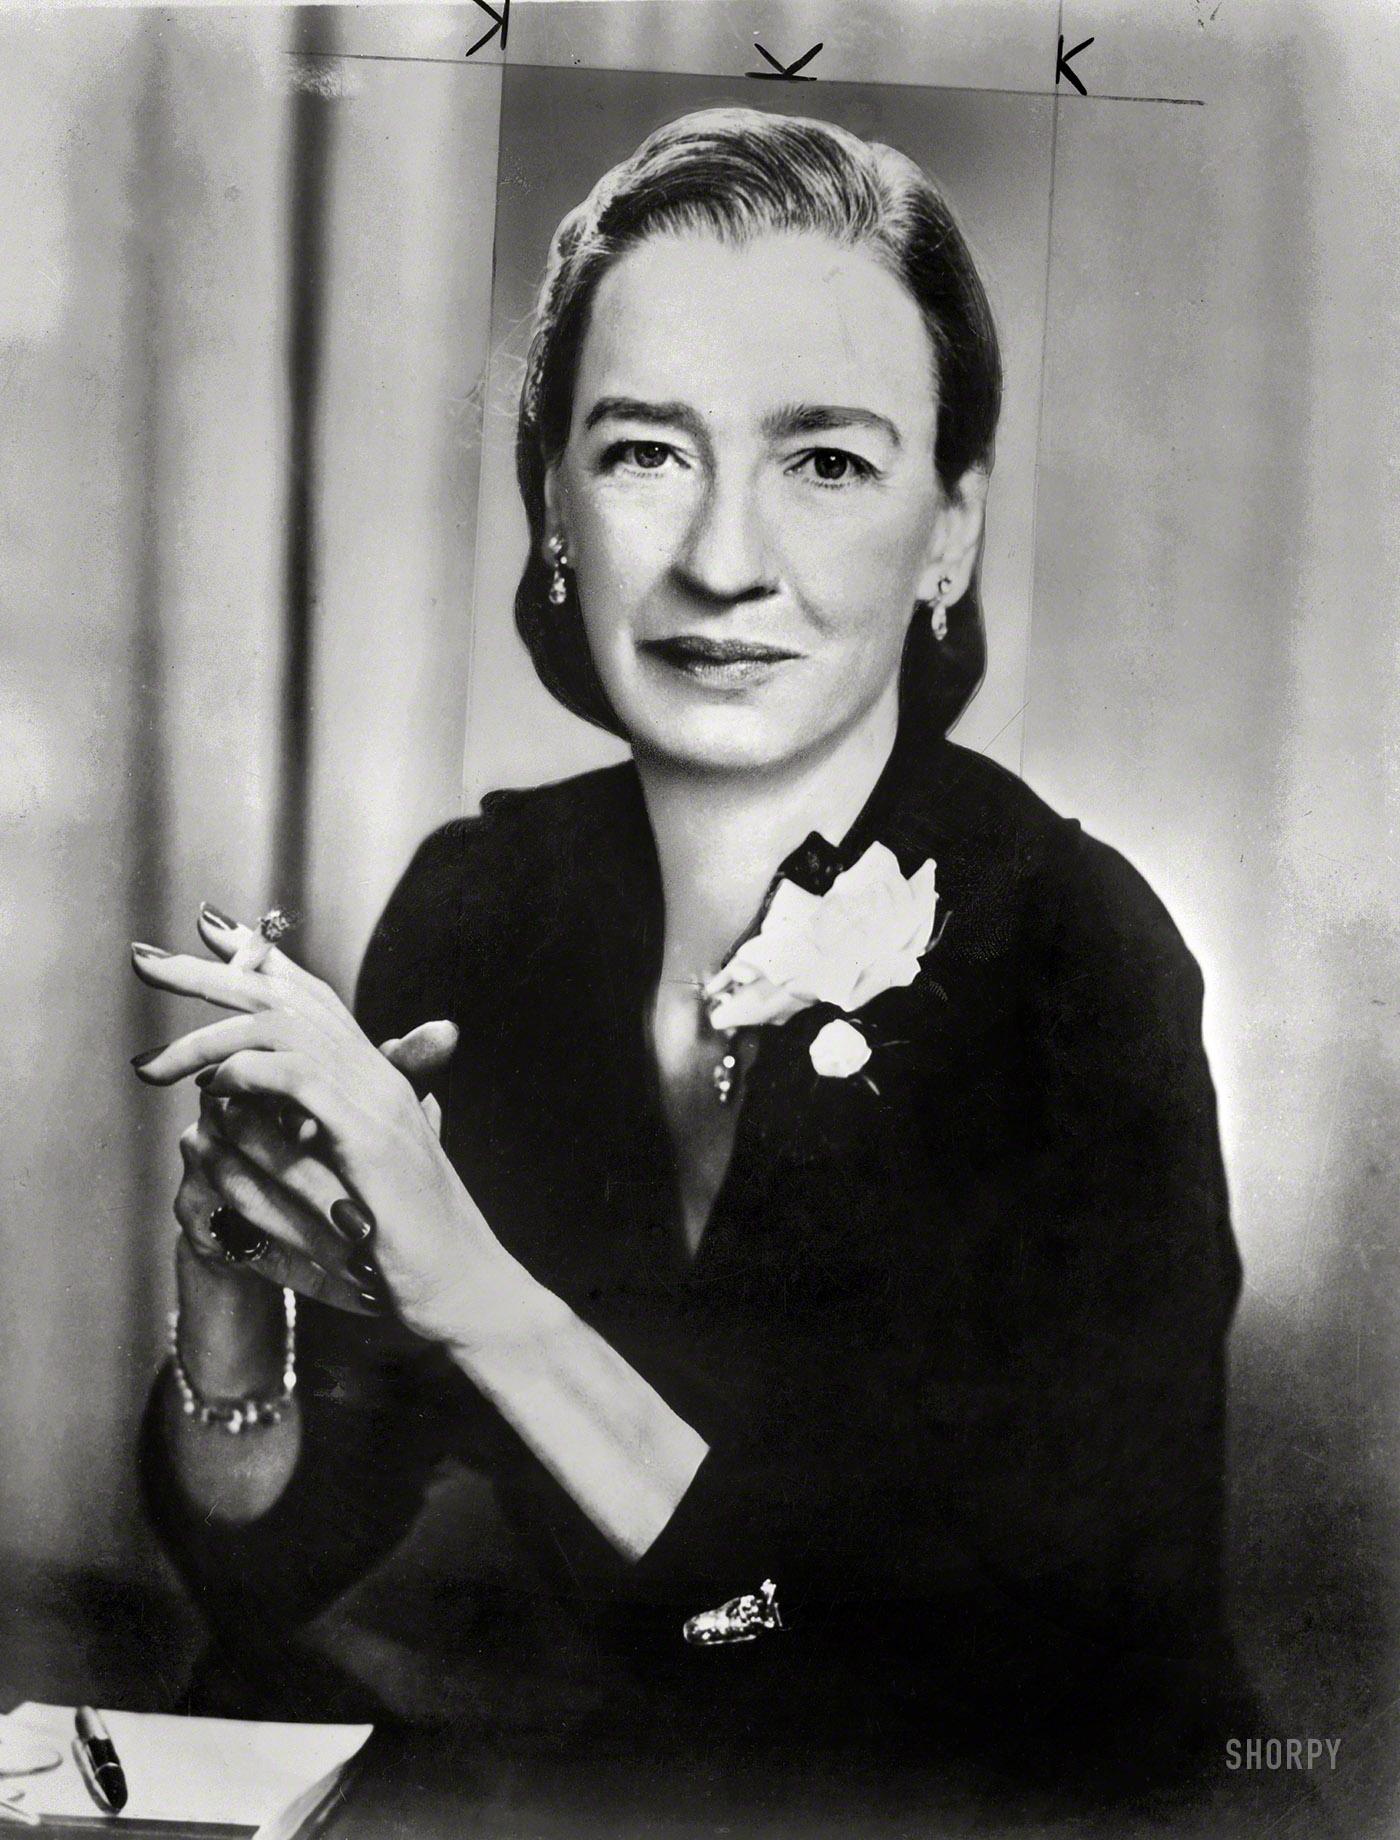 Shorpy Historic Picture Archive :: Amazing Grace: 1950s ... Хопер